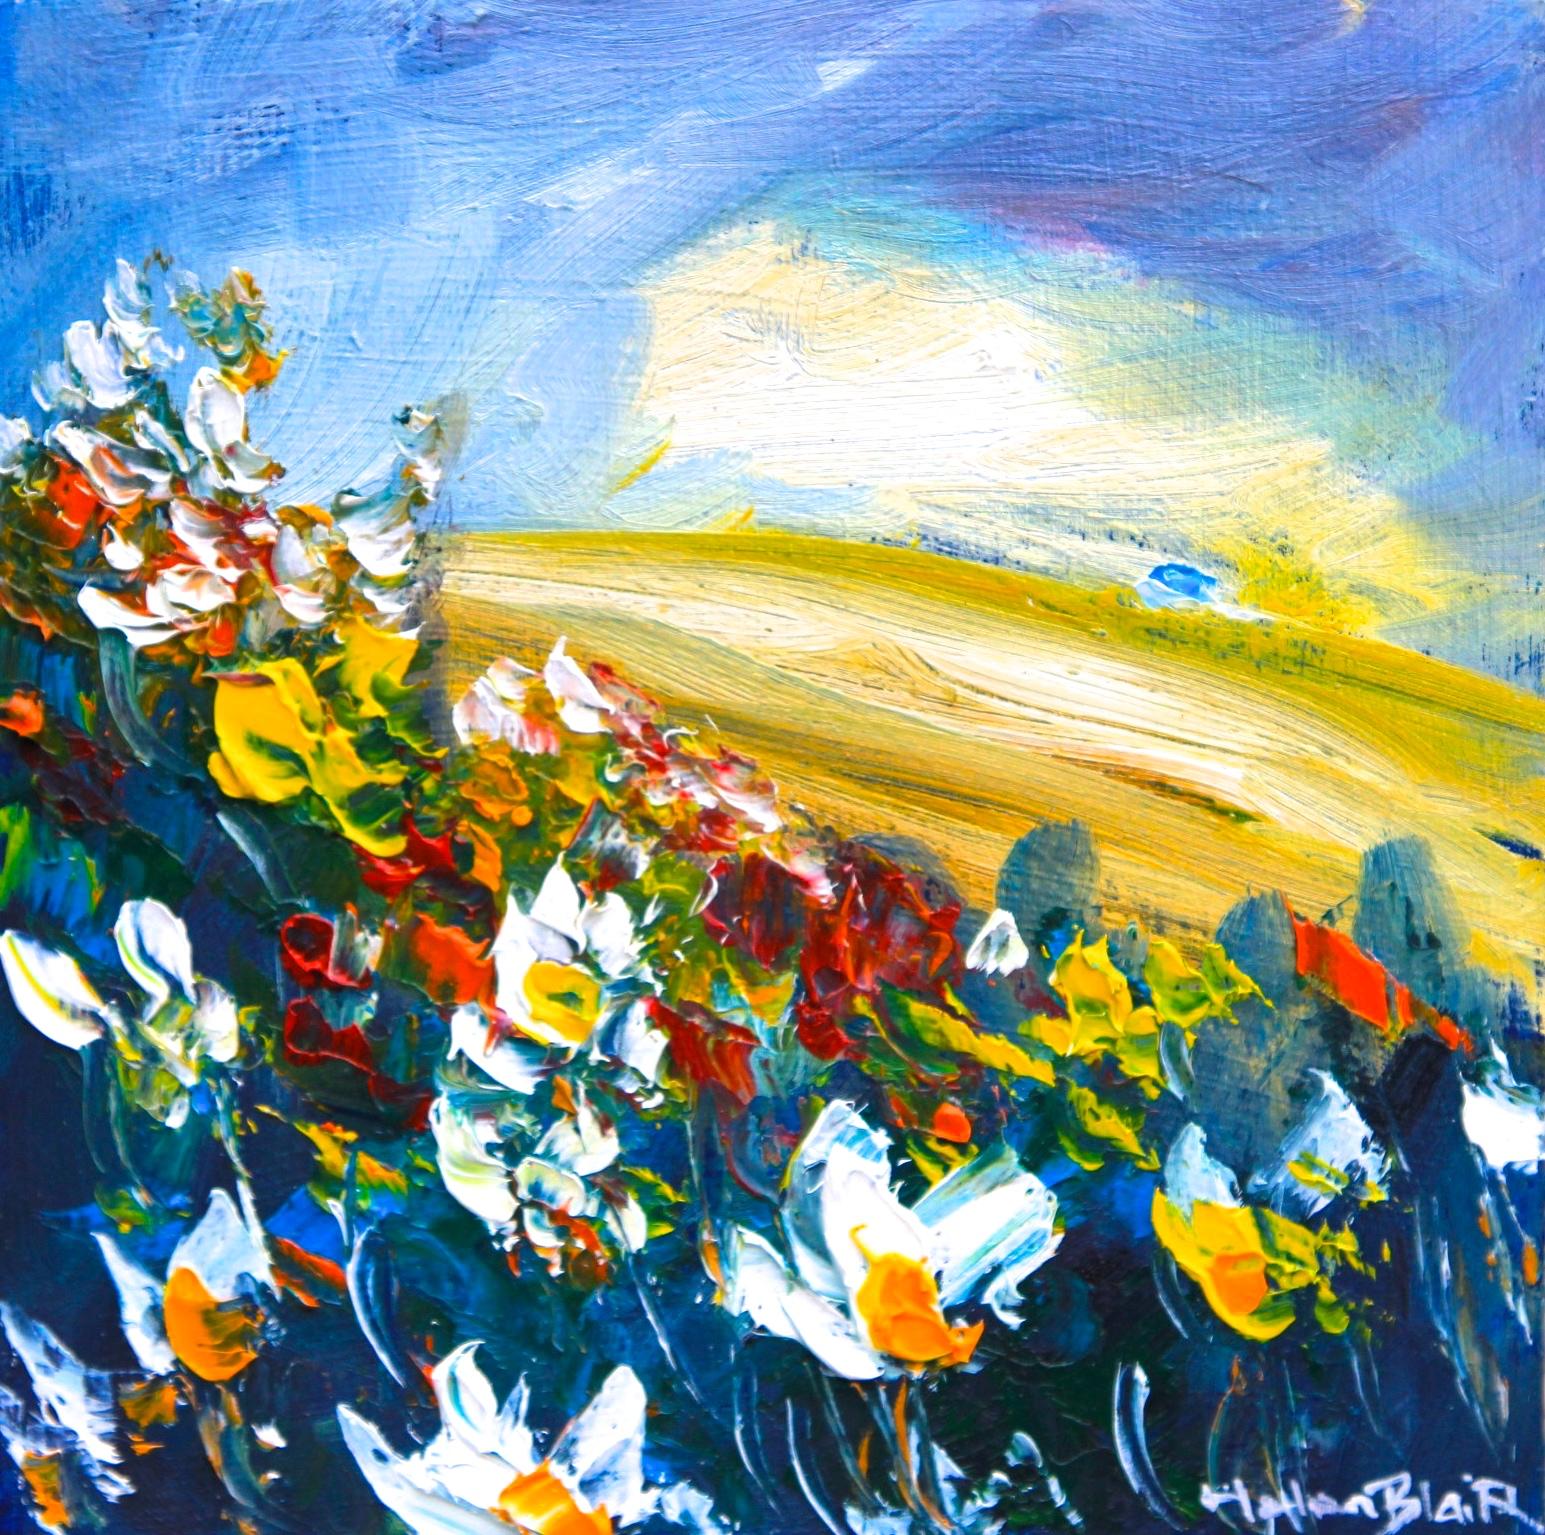 helenblairsart - Wild Flower Hill